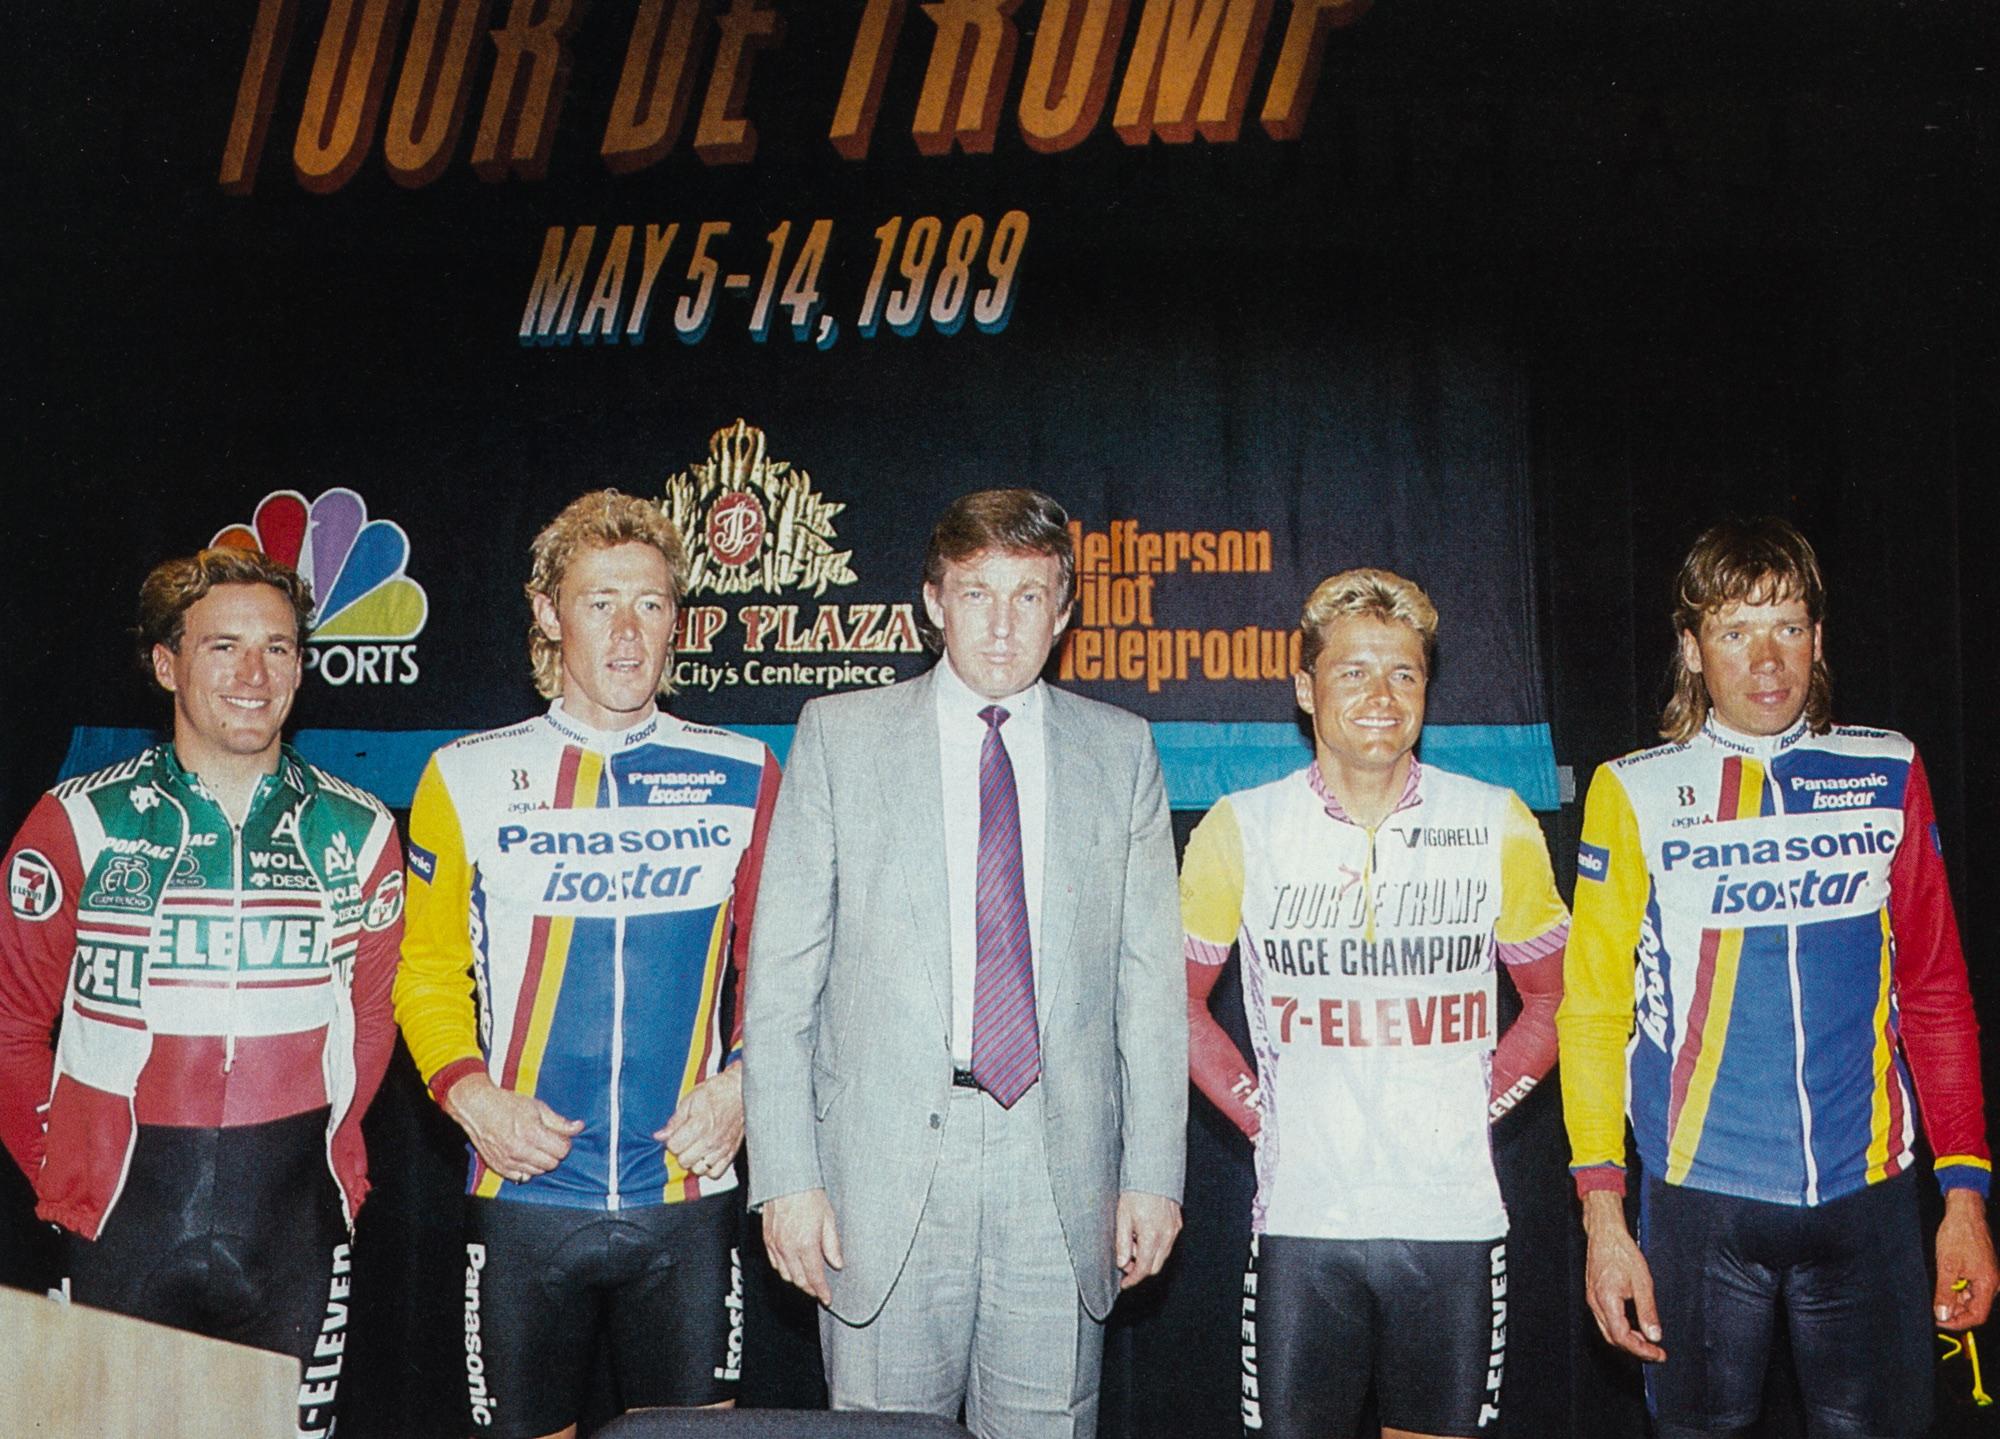 Foto: Presse Sports - Deschamps